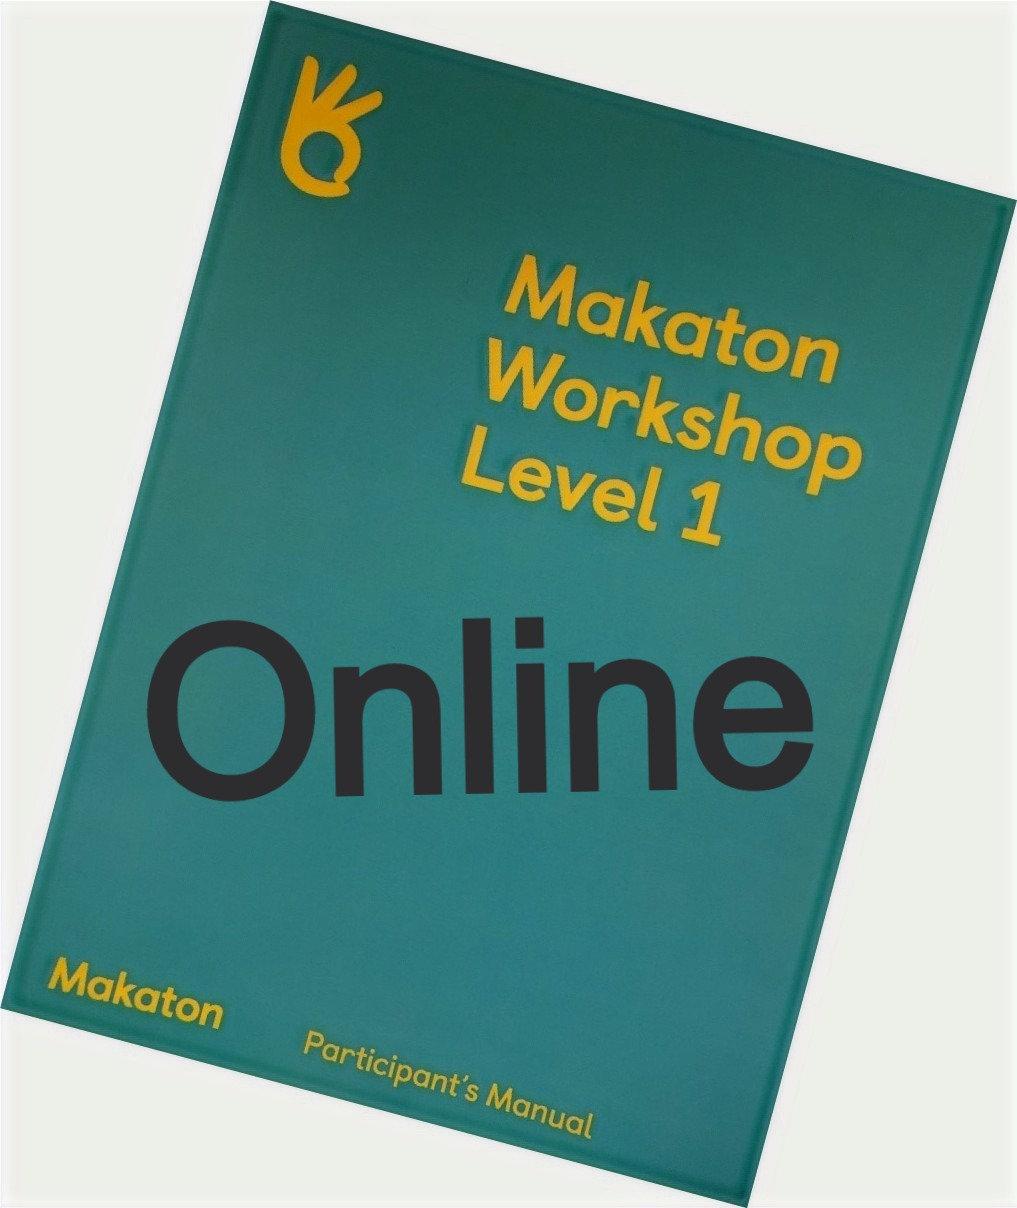 ONLINE Makaton Workshop Level 1